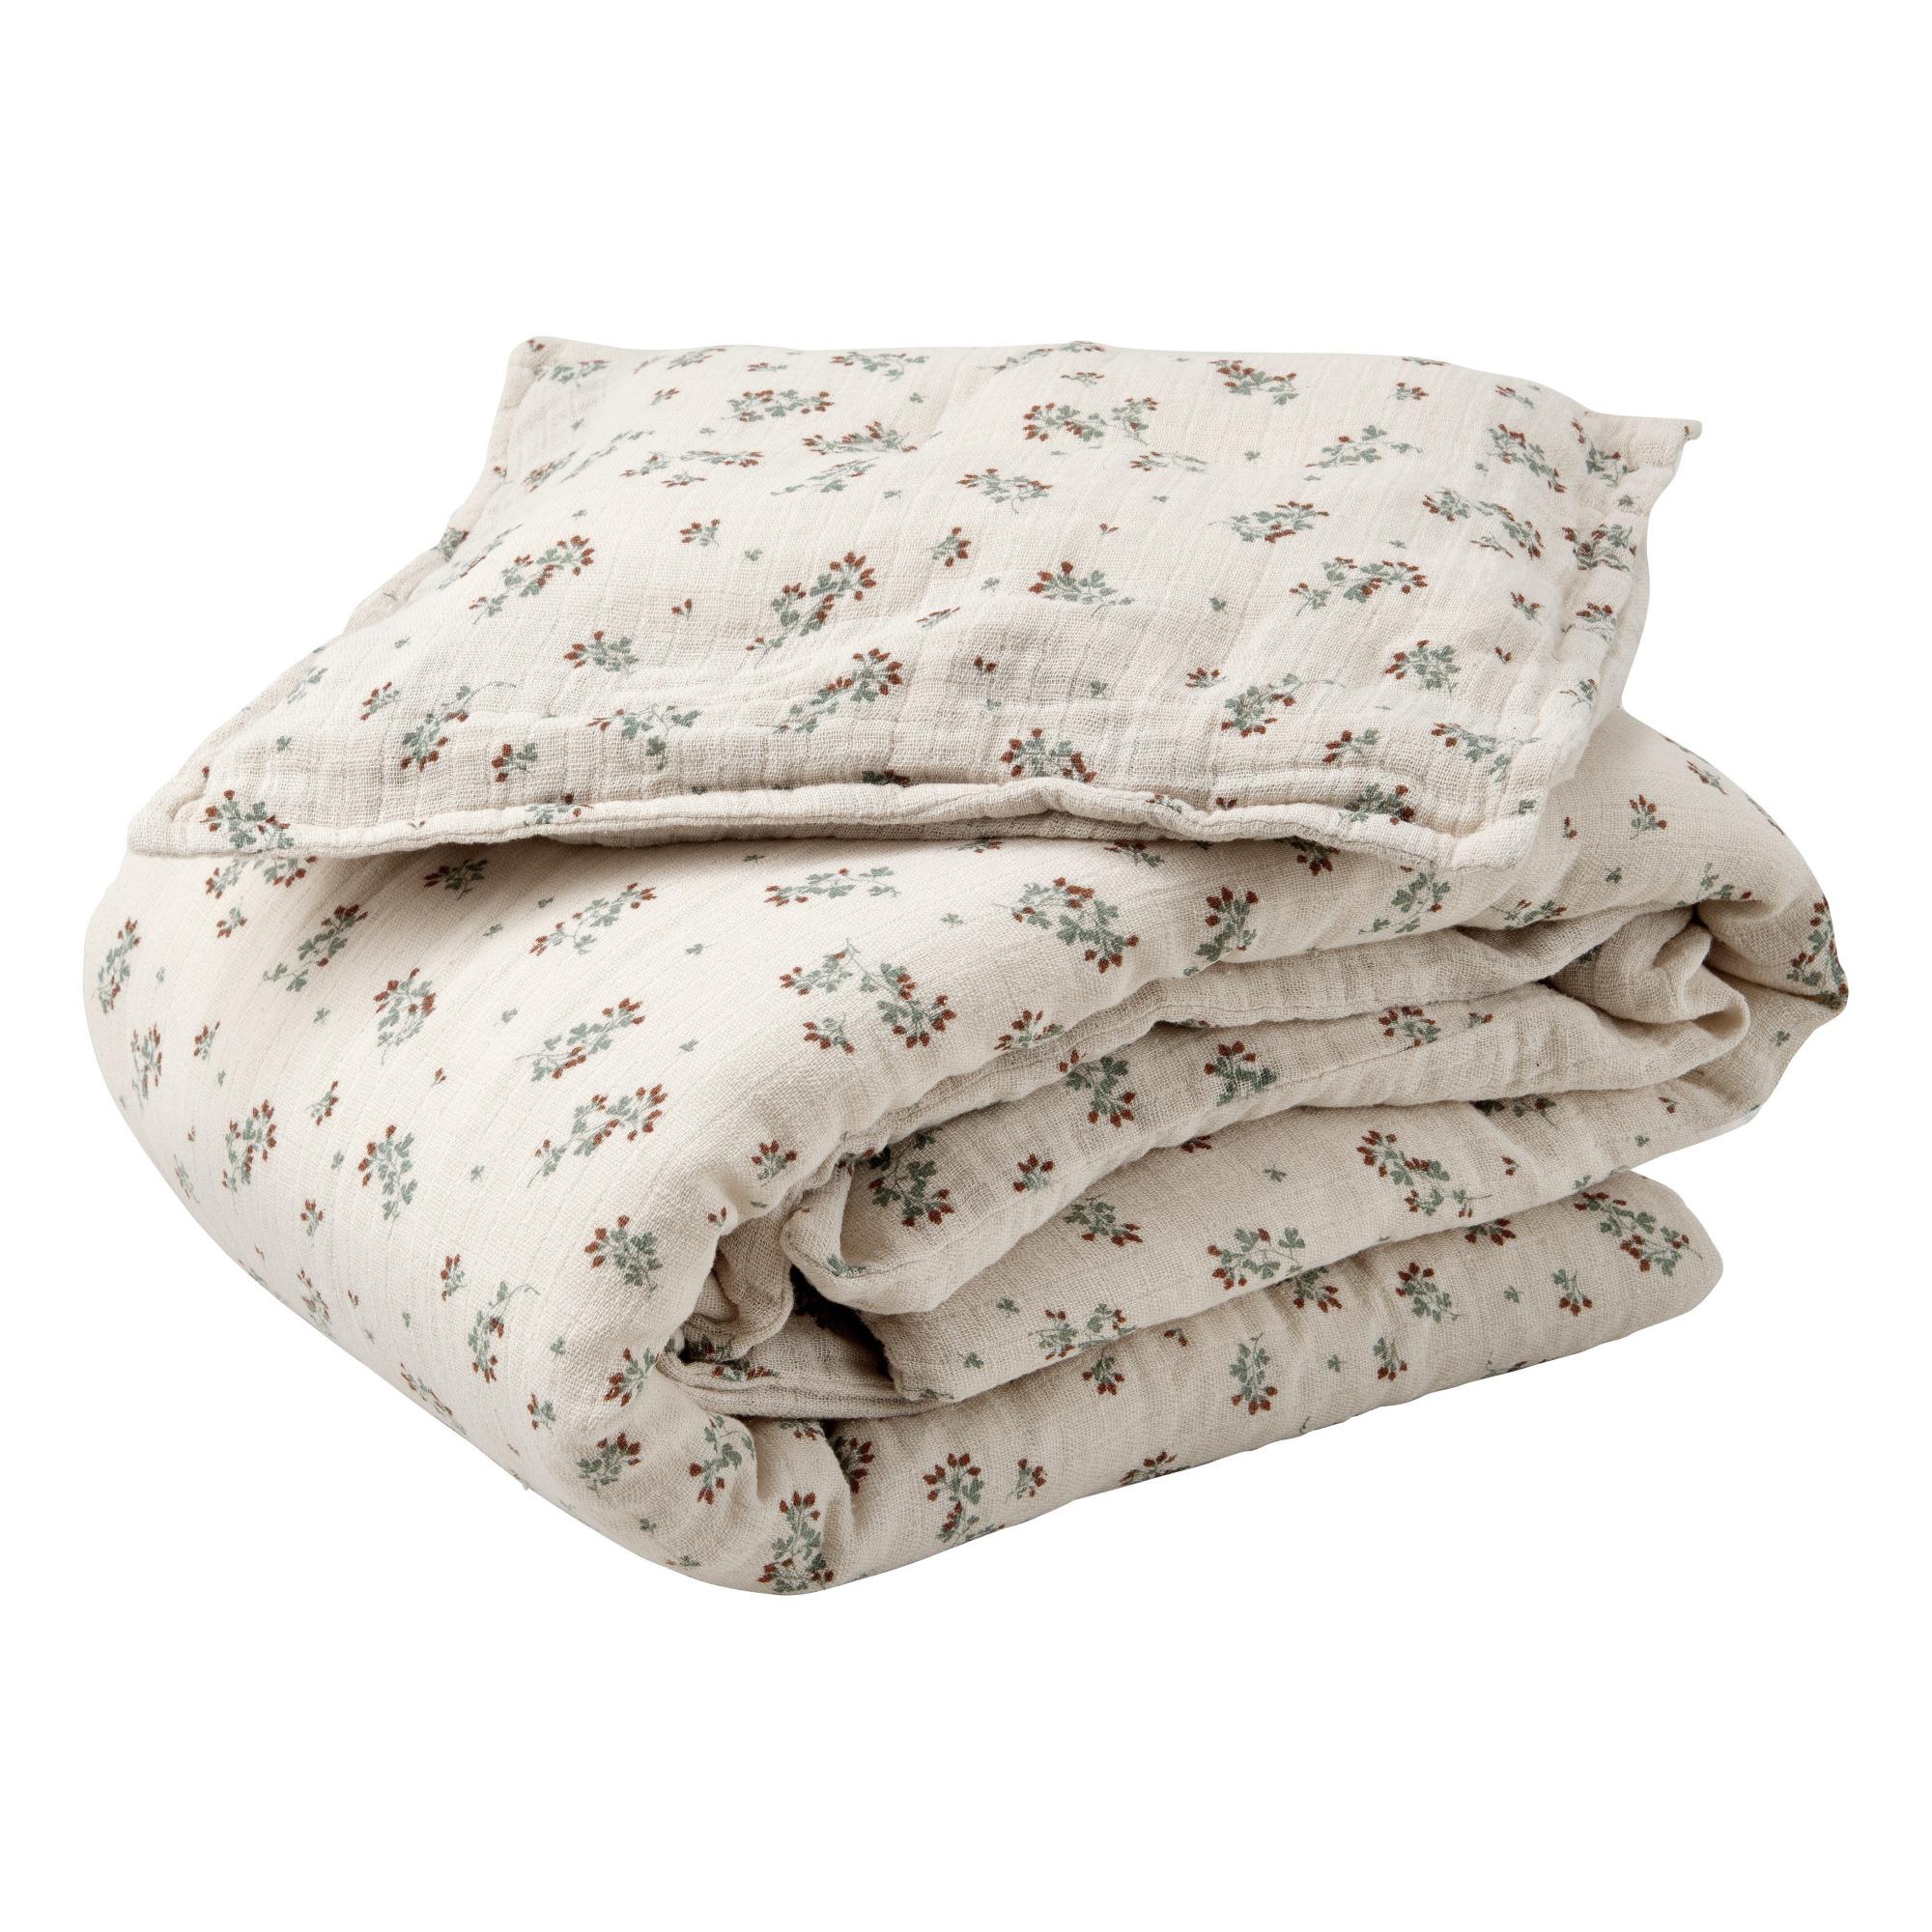 Ropa de cama de gasa de algodón de Garbo&friends. De venta en Smallable (86 euros).